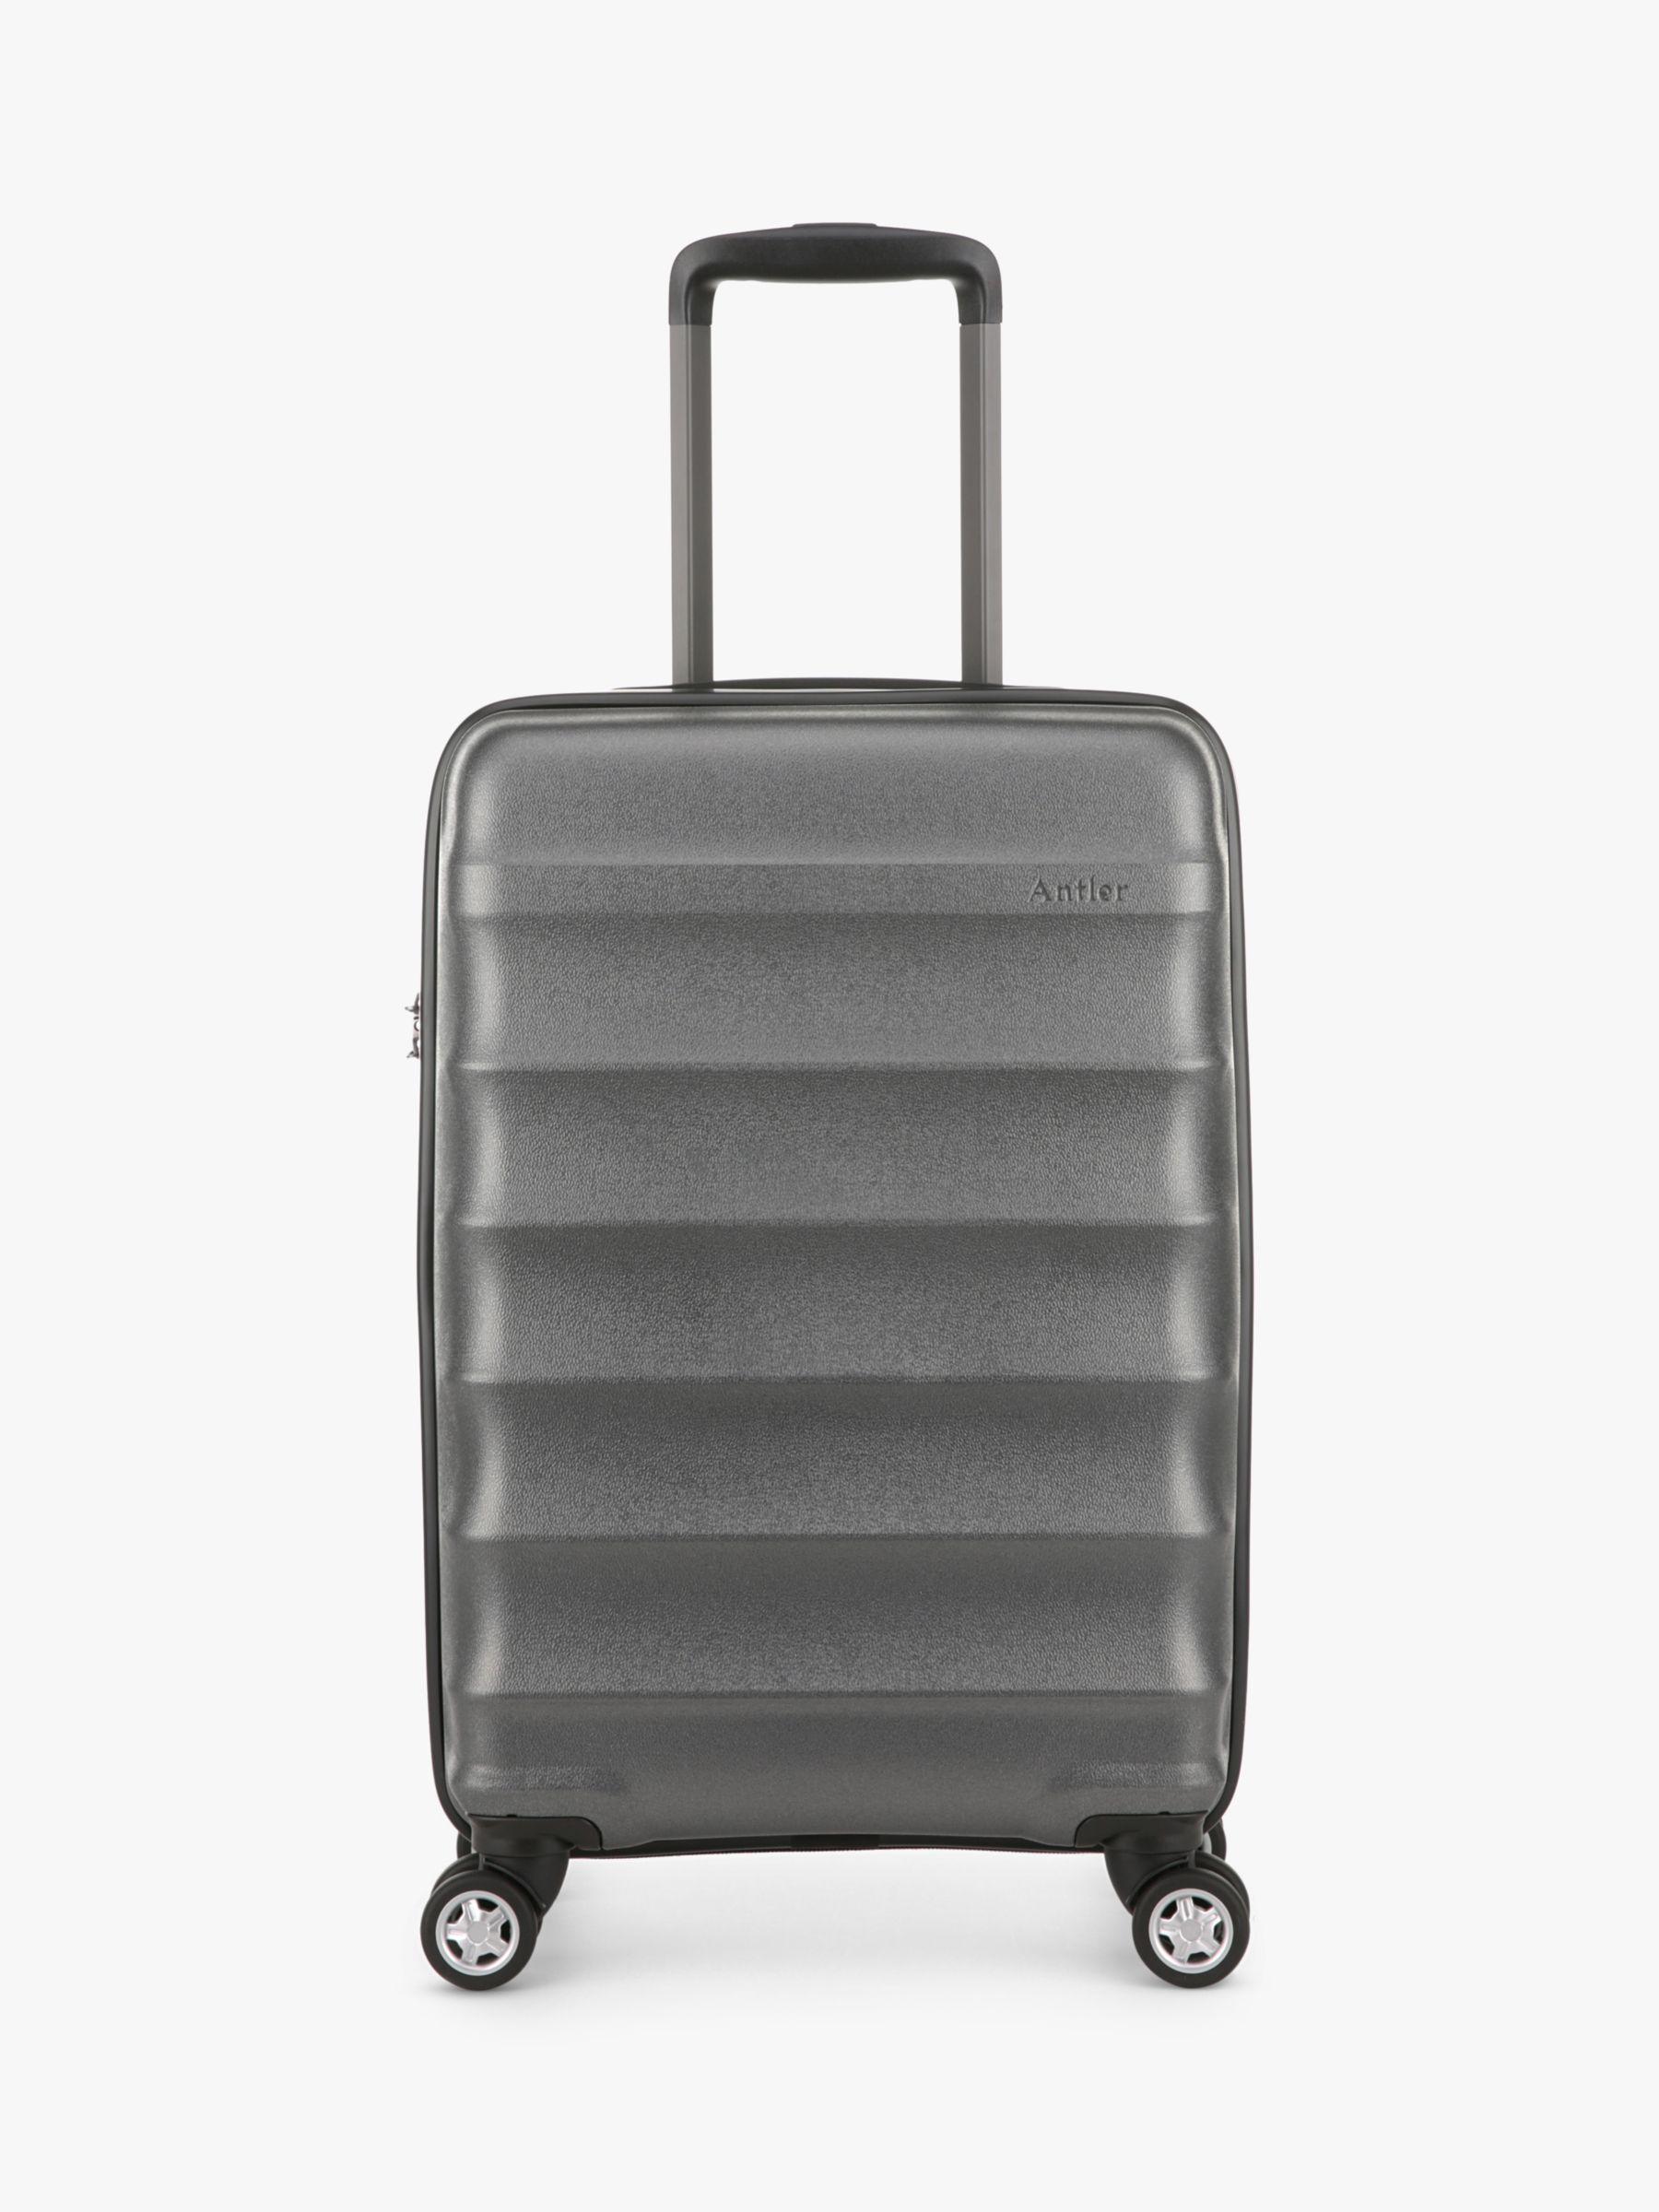 Antler Antler Juno Metallic DLX 4-Wheel 56cm Expandable Cabin Case